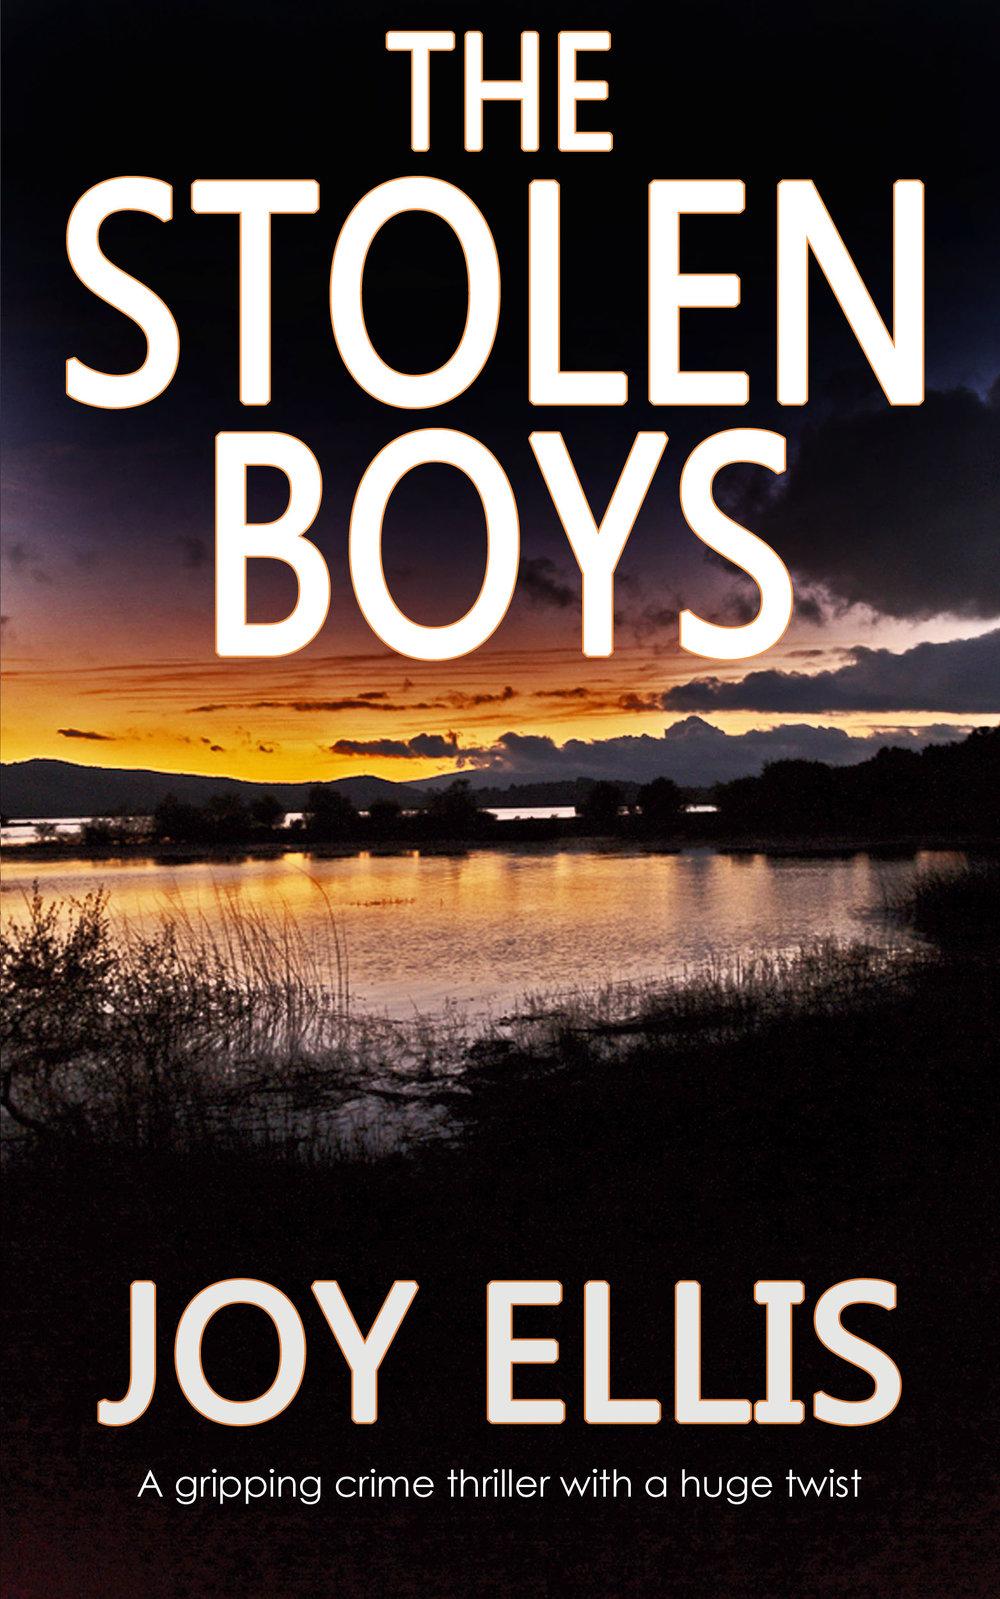 THE STOLEN BOYS.jpg